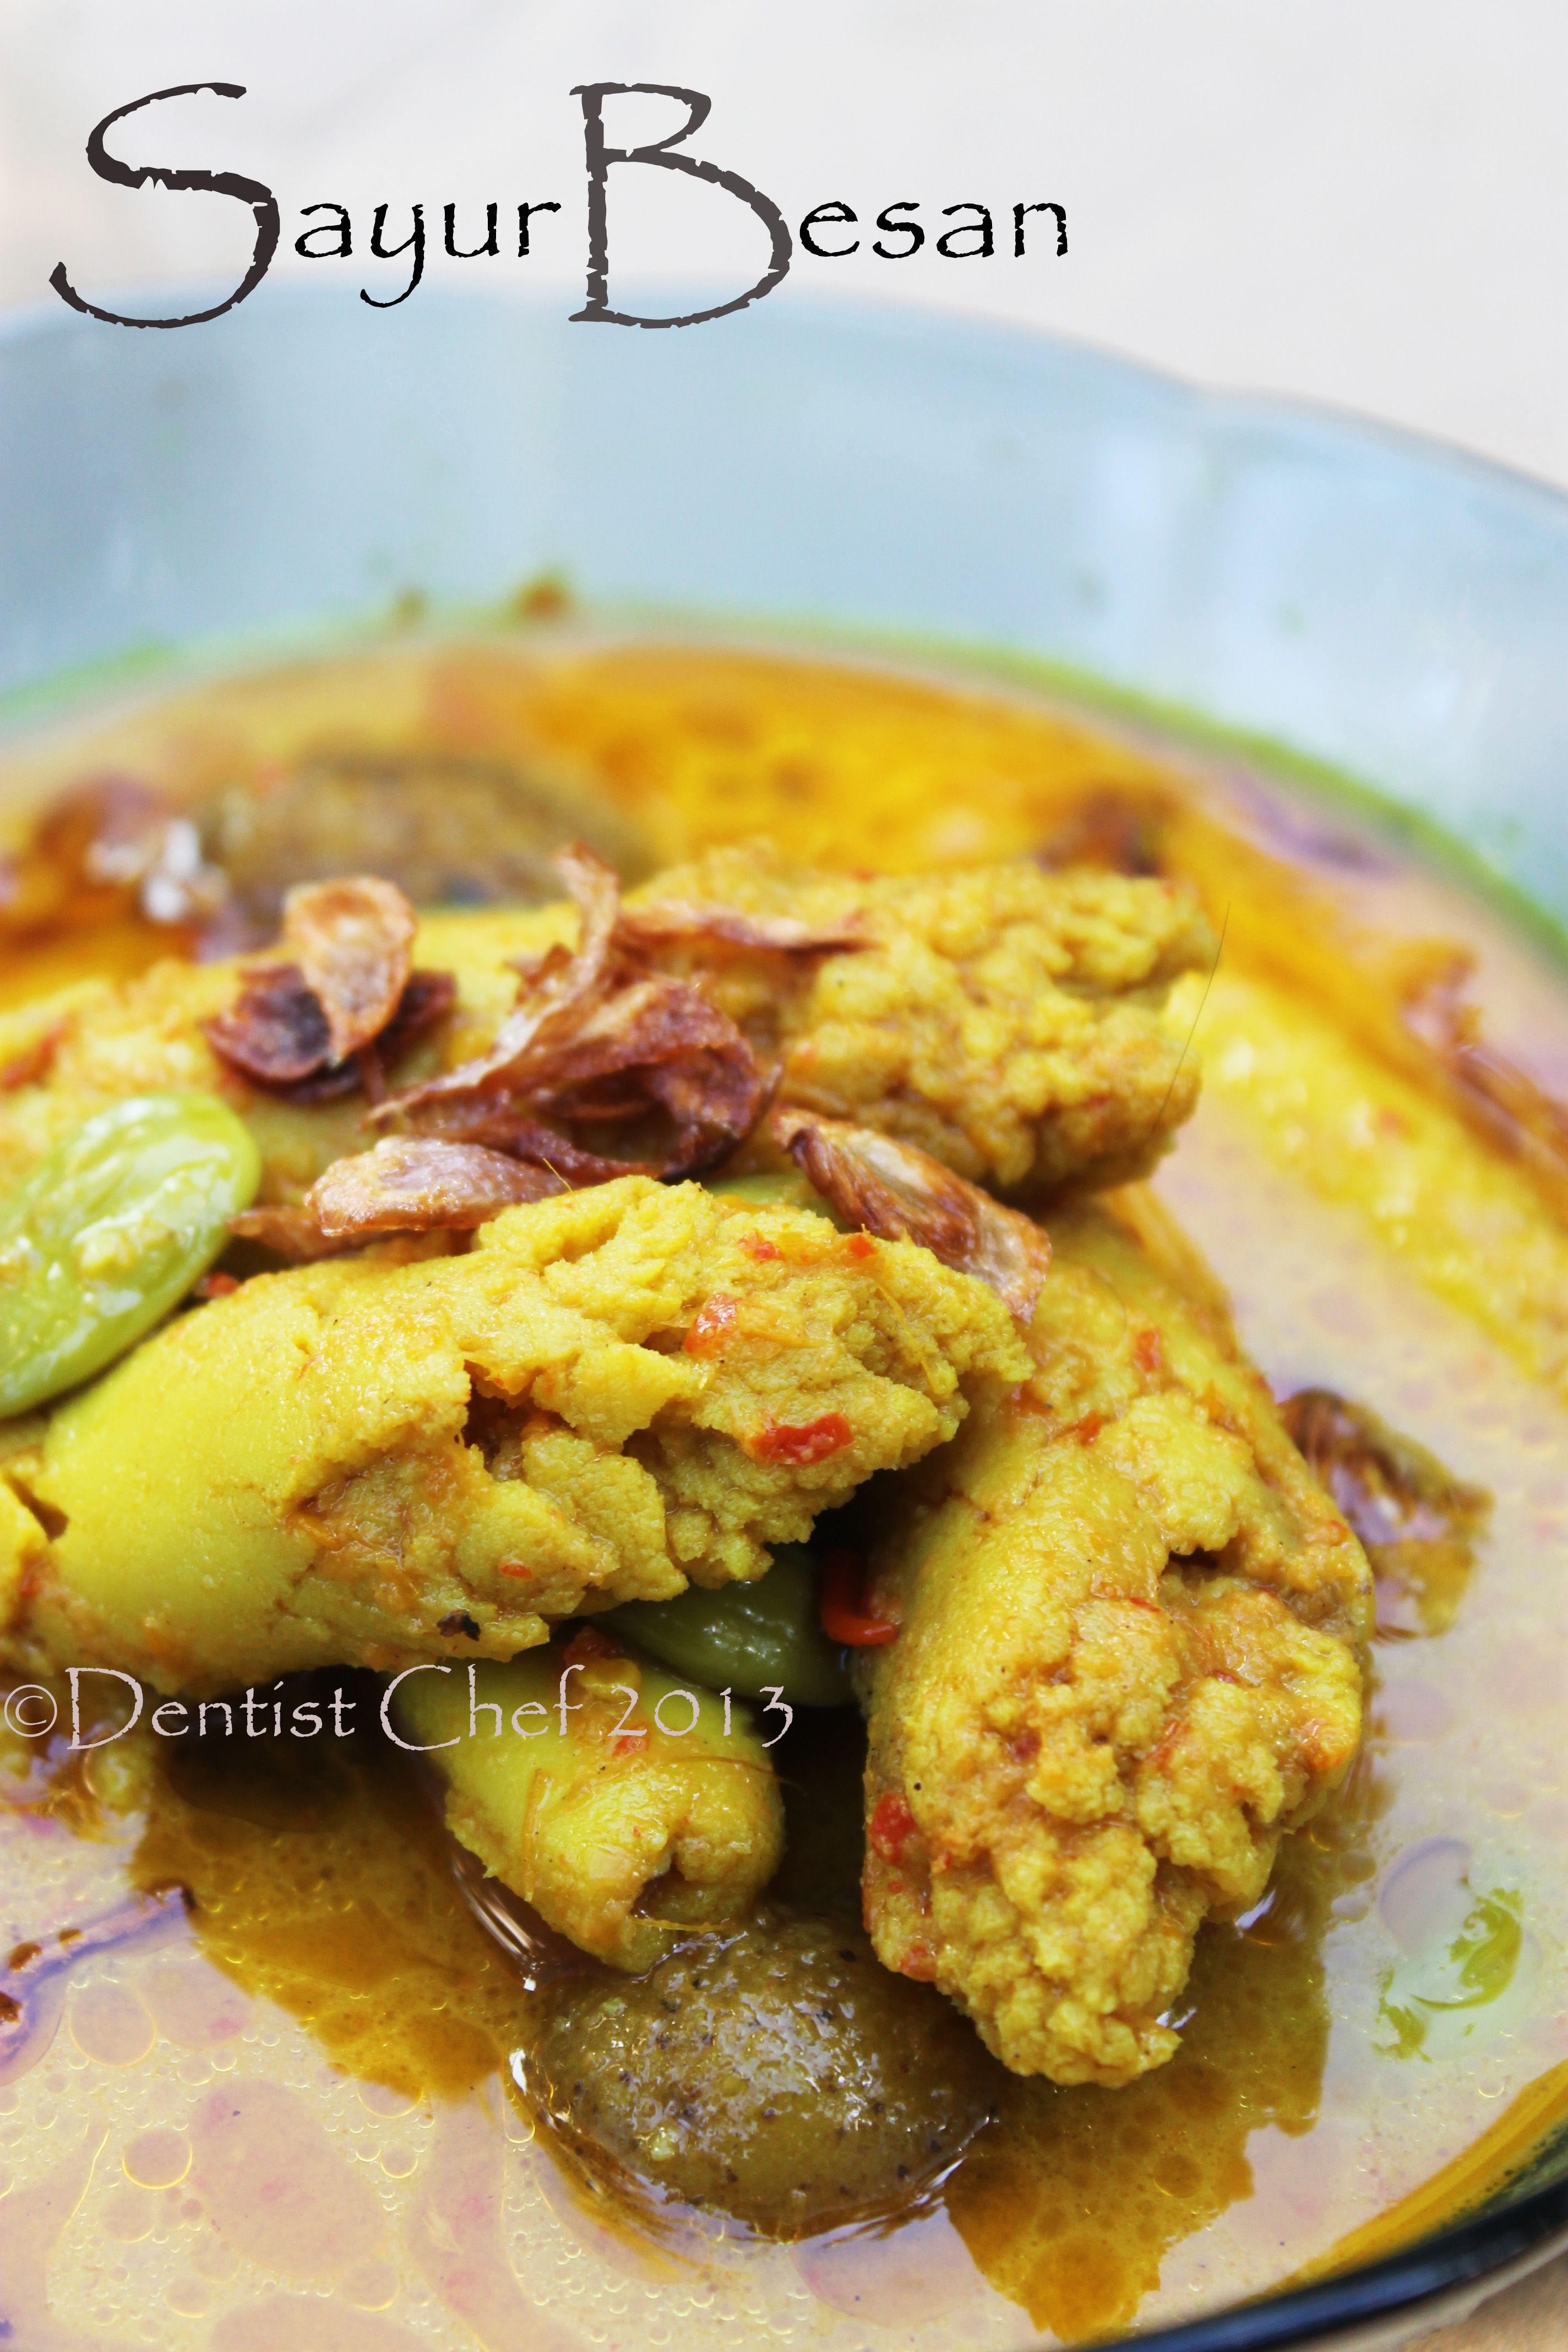 Resep Sayur Besan Khas Betawi A Jakarta S Herritage Sugar Cane Blossom Curry Resep Makanan Gulai